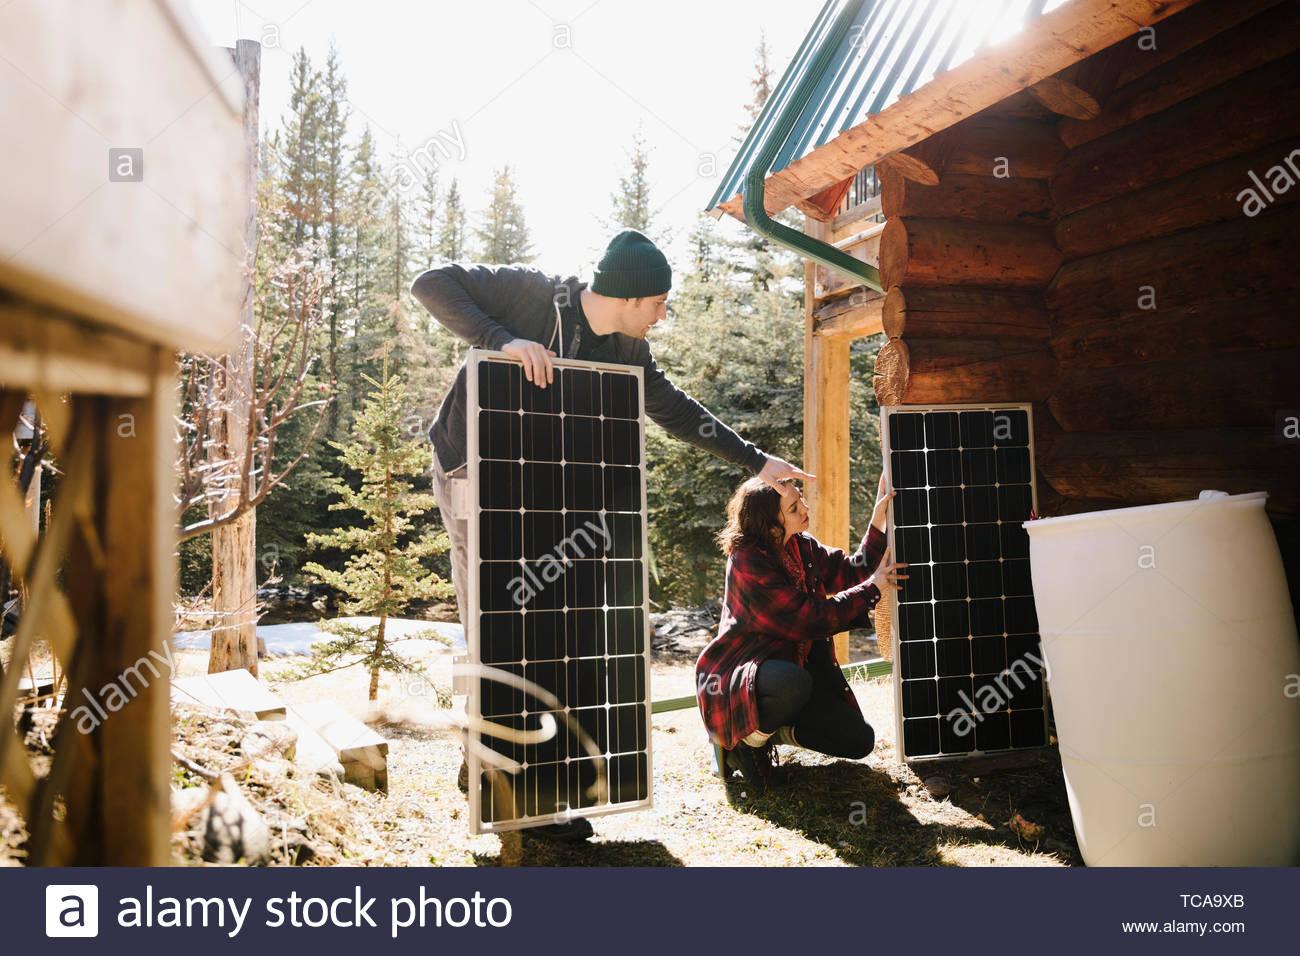 Couple installing solar panels outside cabin - Stock Image